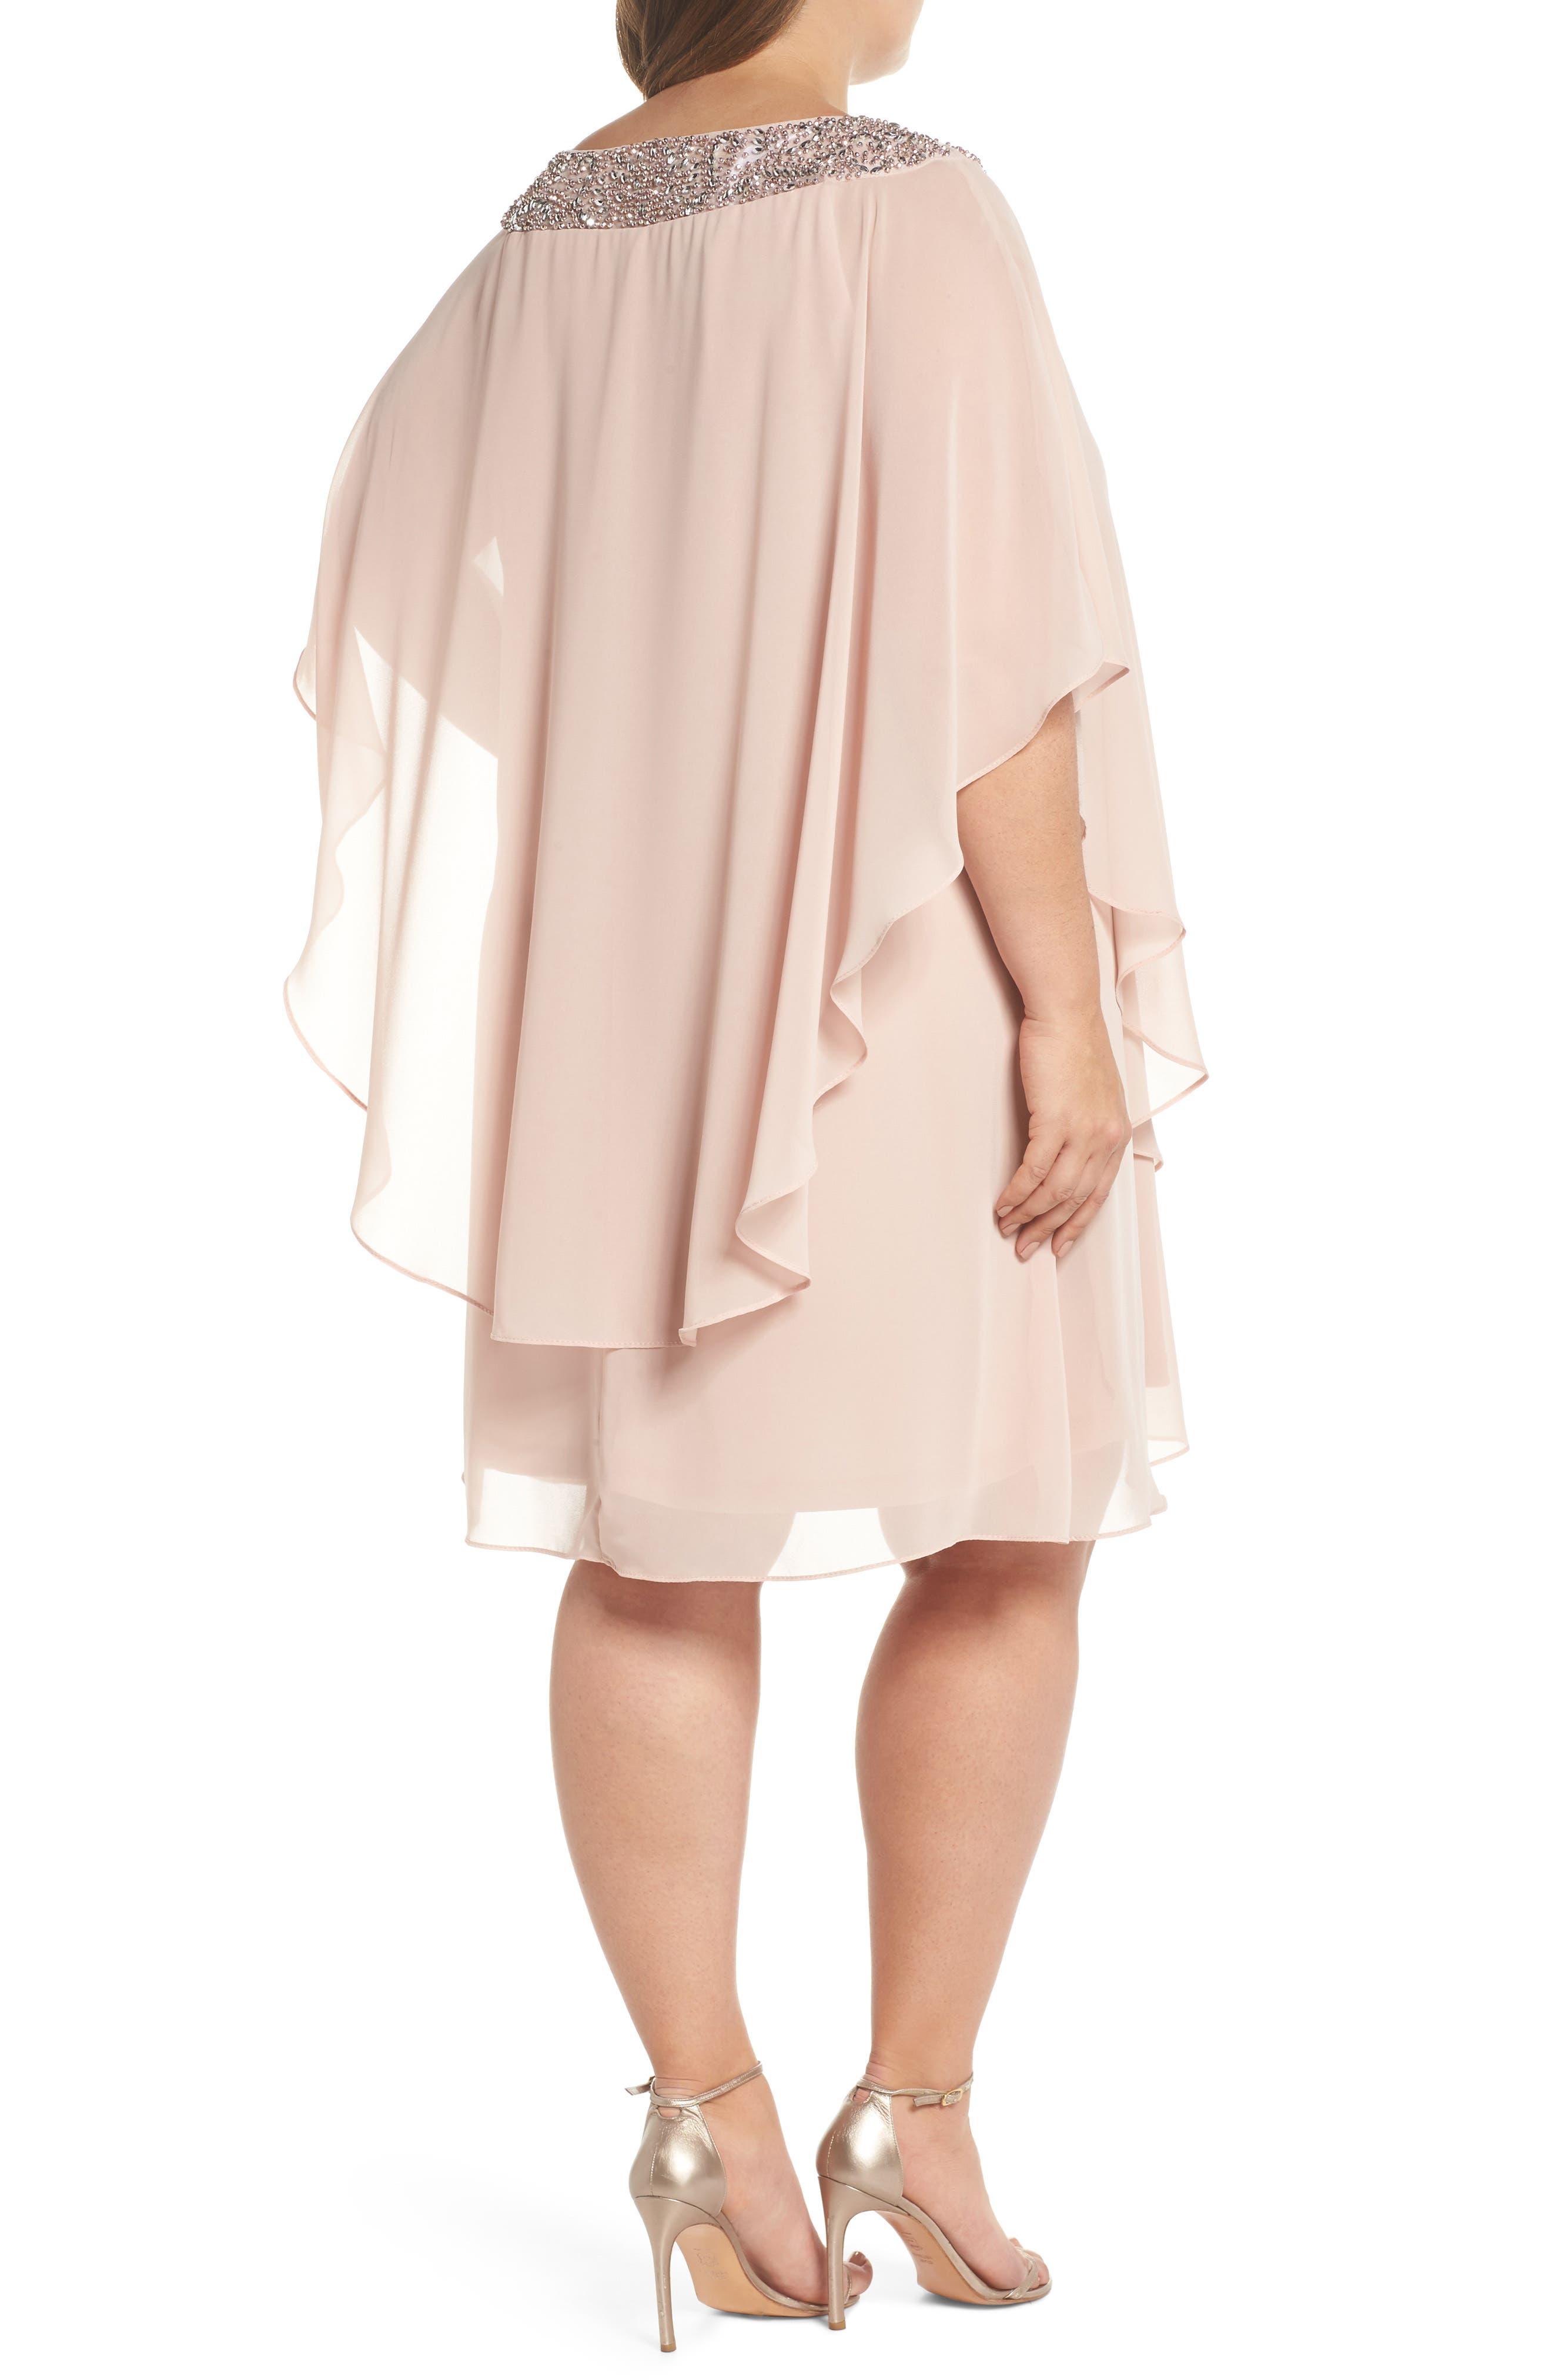 XSCAPE, Beaded Neck Chiffon Overlay Dress, Alternate thumbnail 2, color, BLUSH/ SILVER